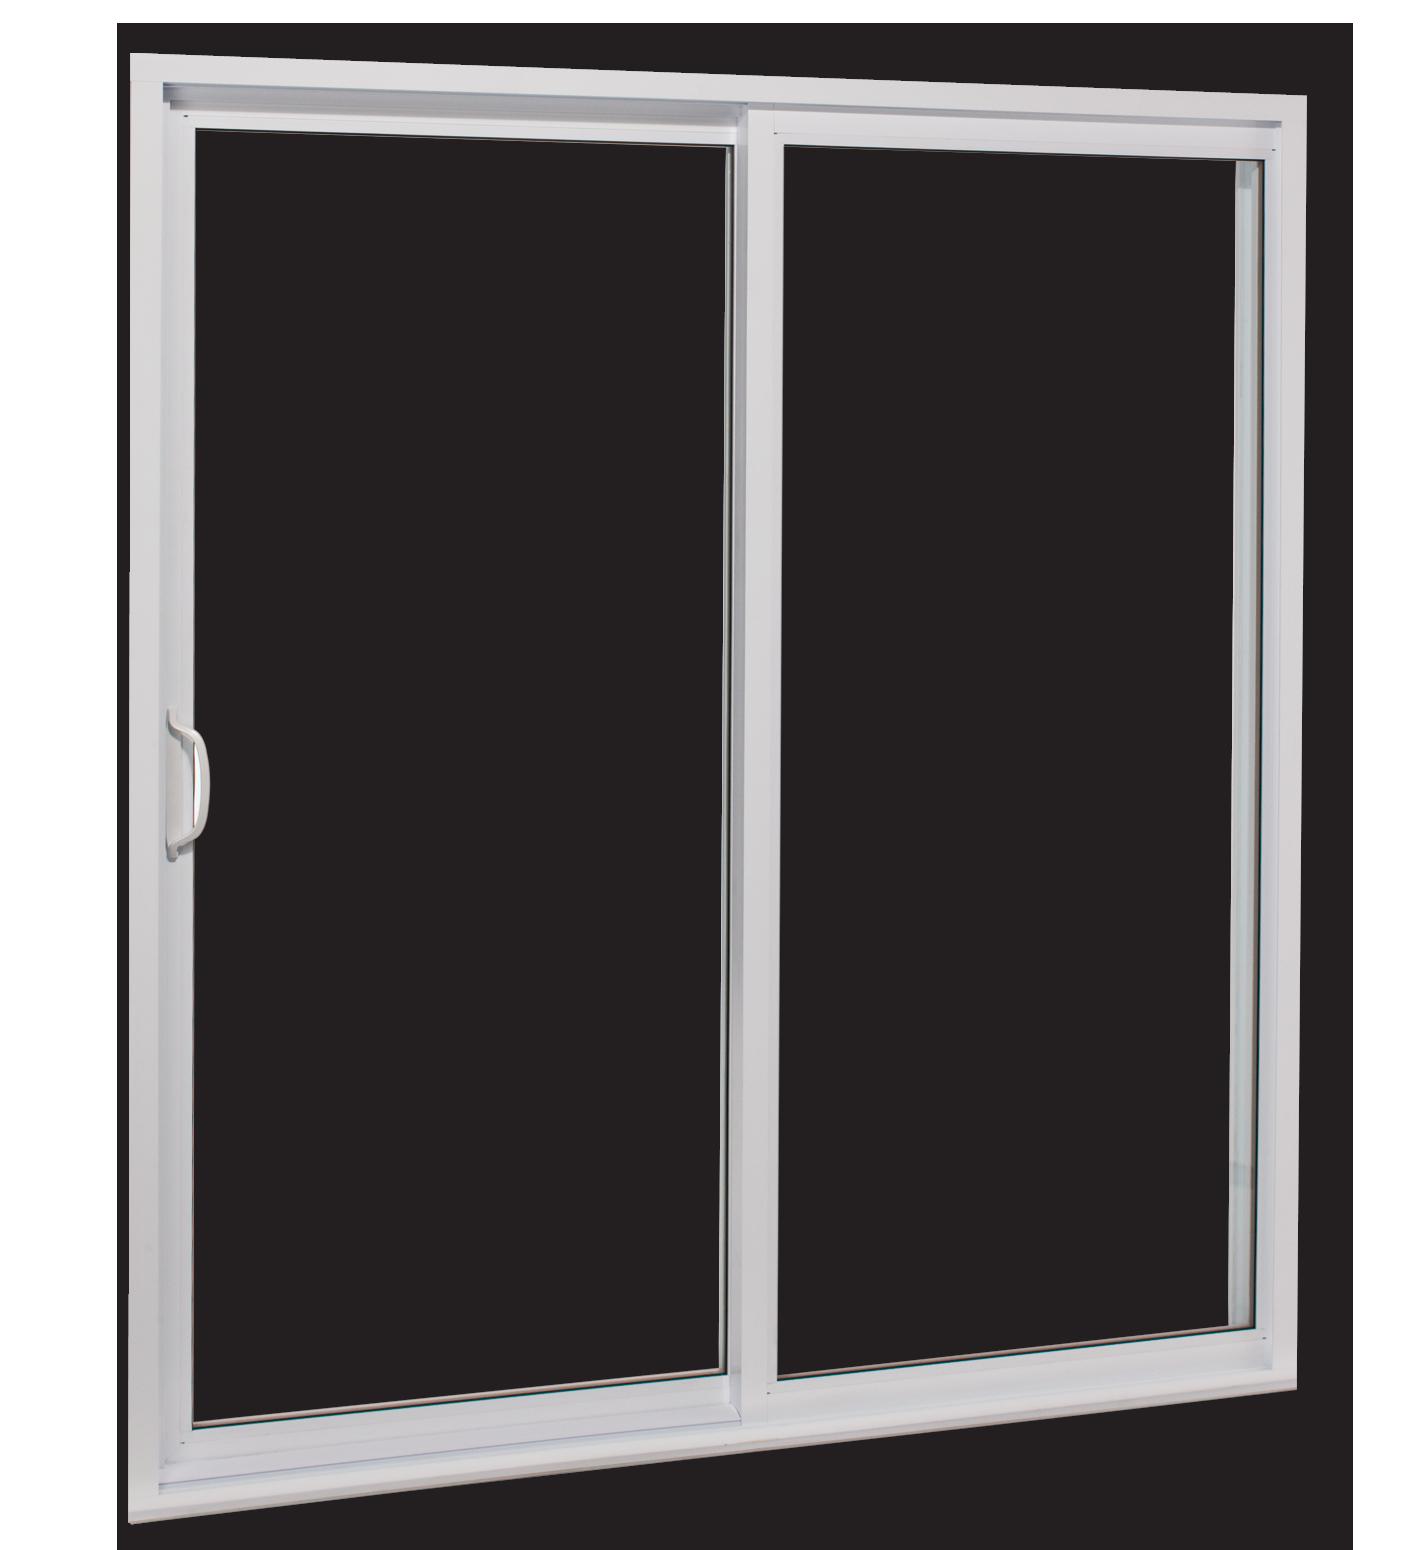 R301 Patio Door White on White Background